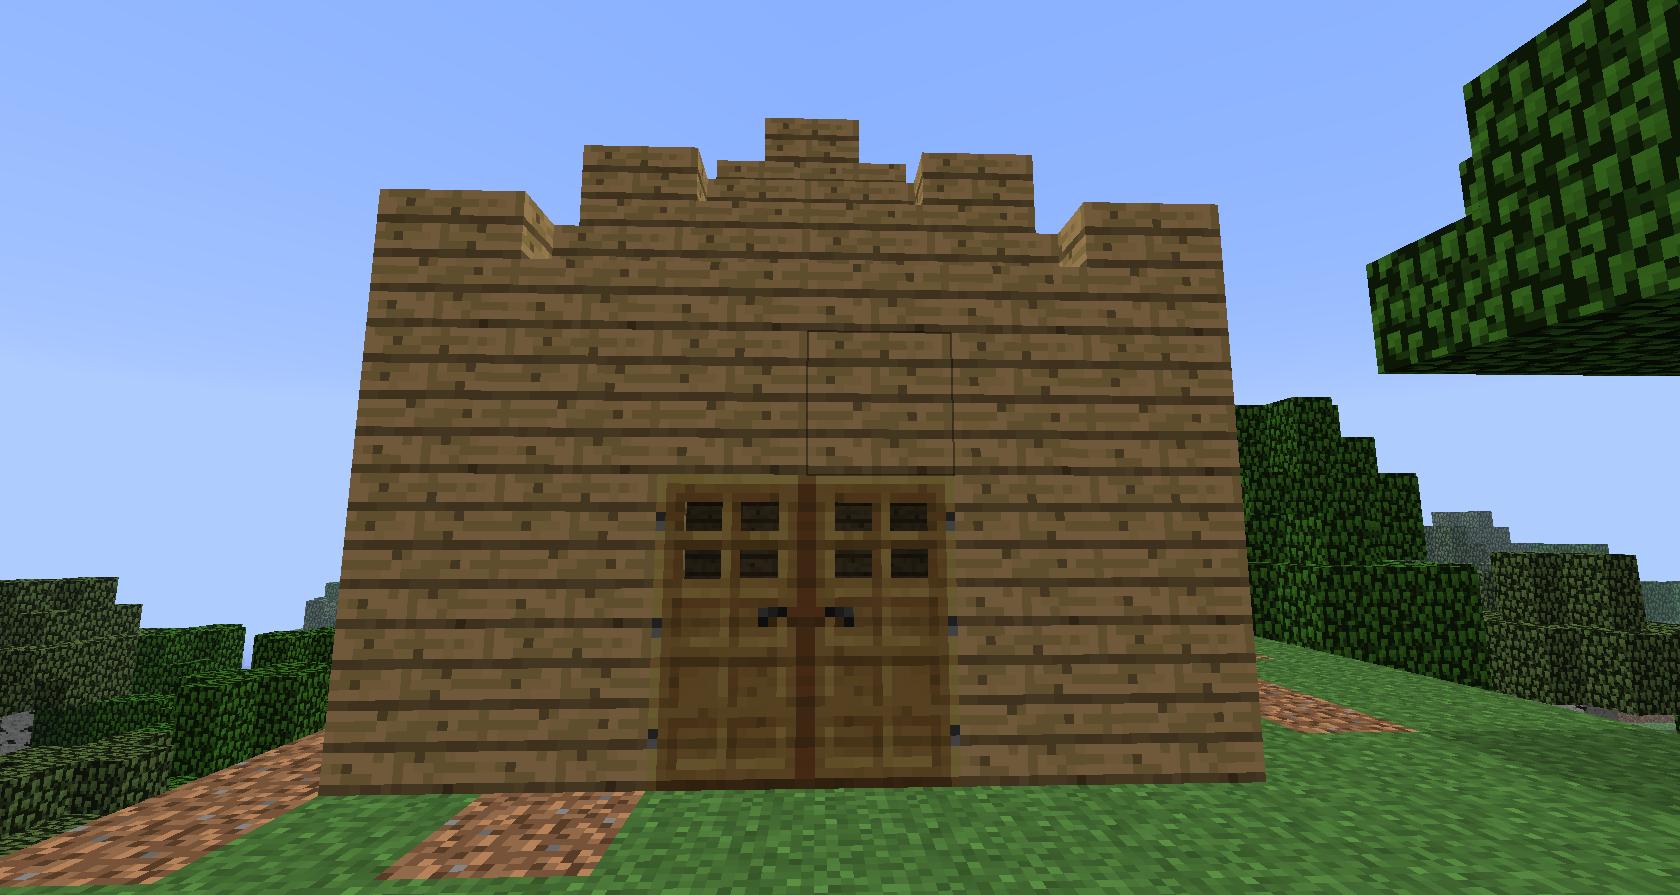 1 1 simple save - Maison minecraft simple ...